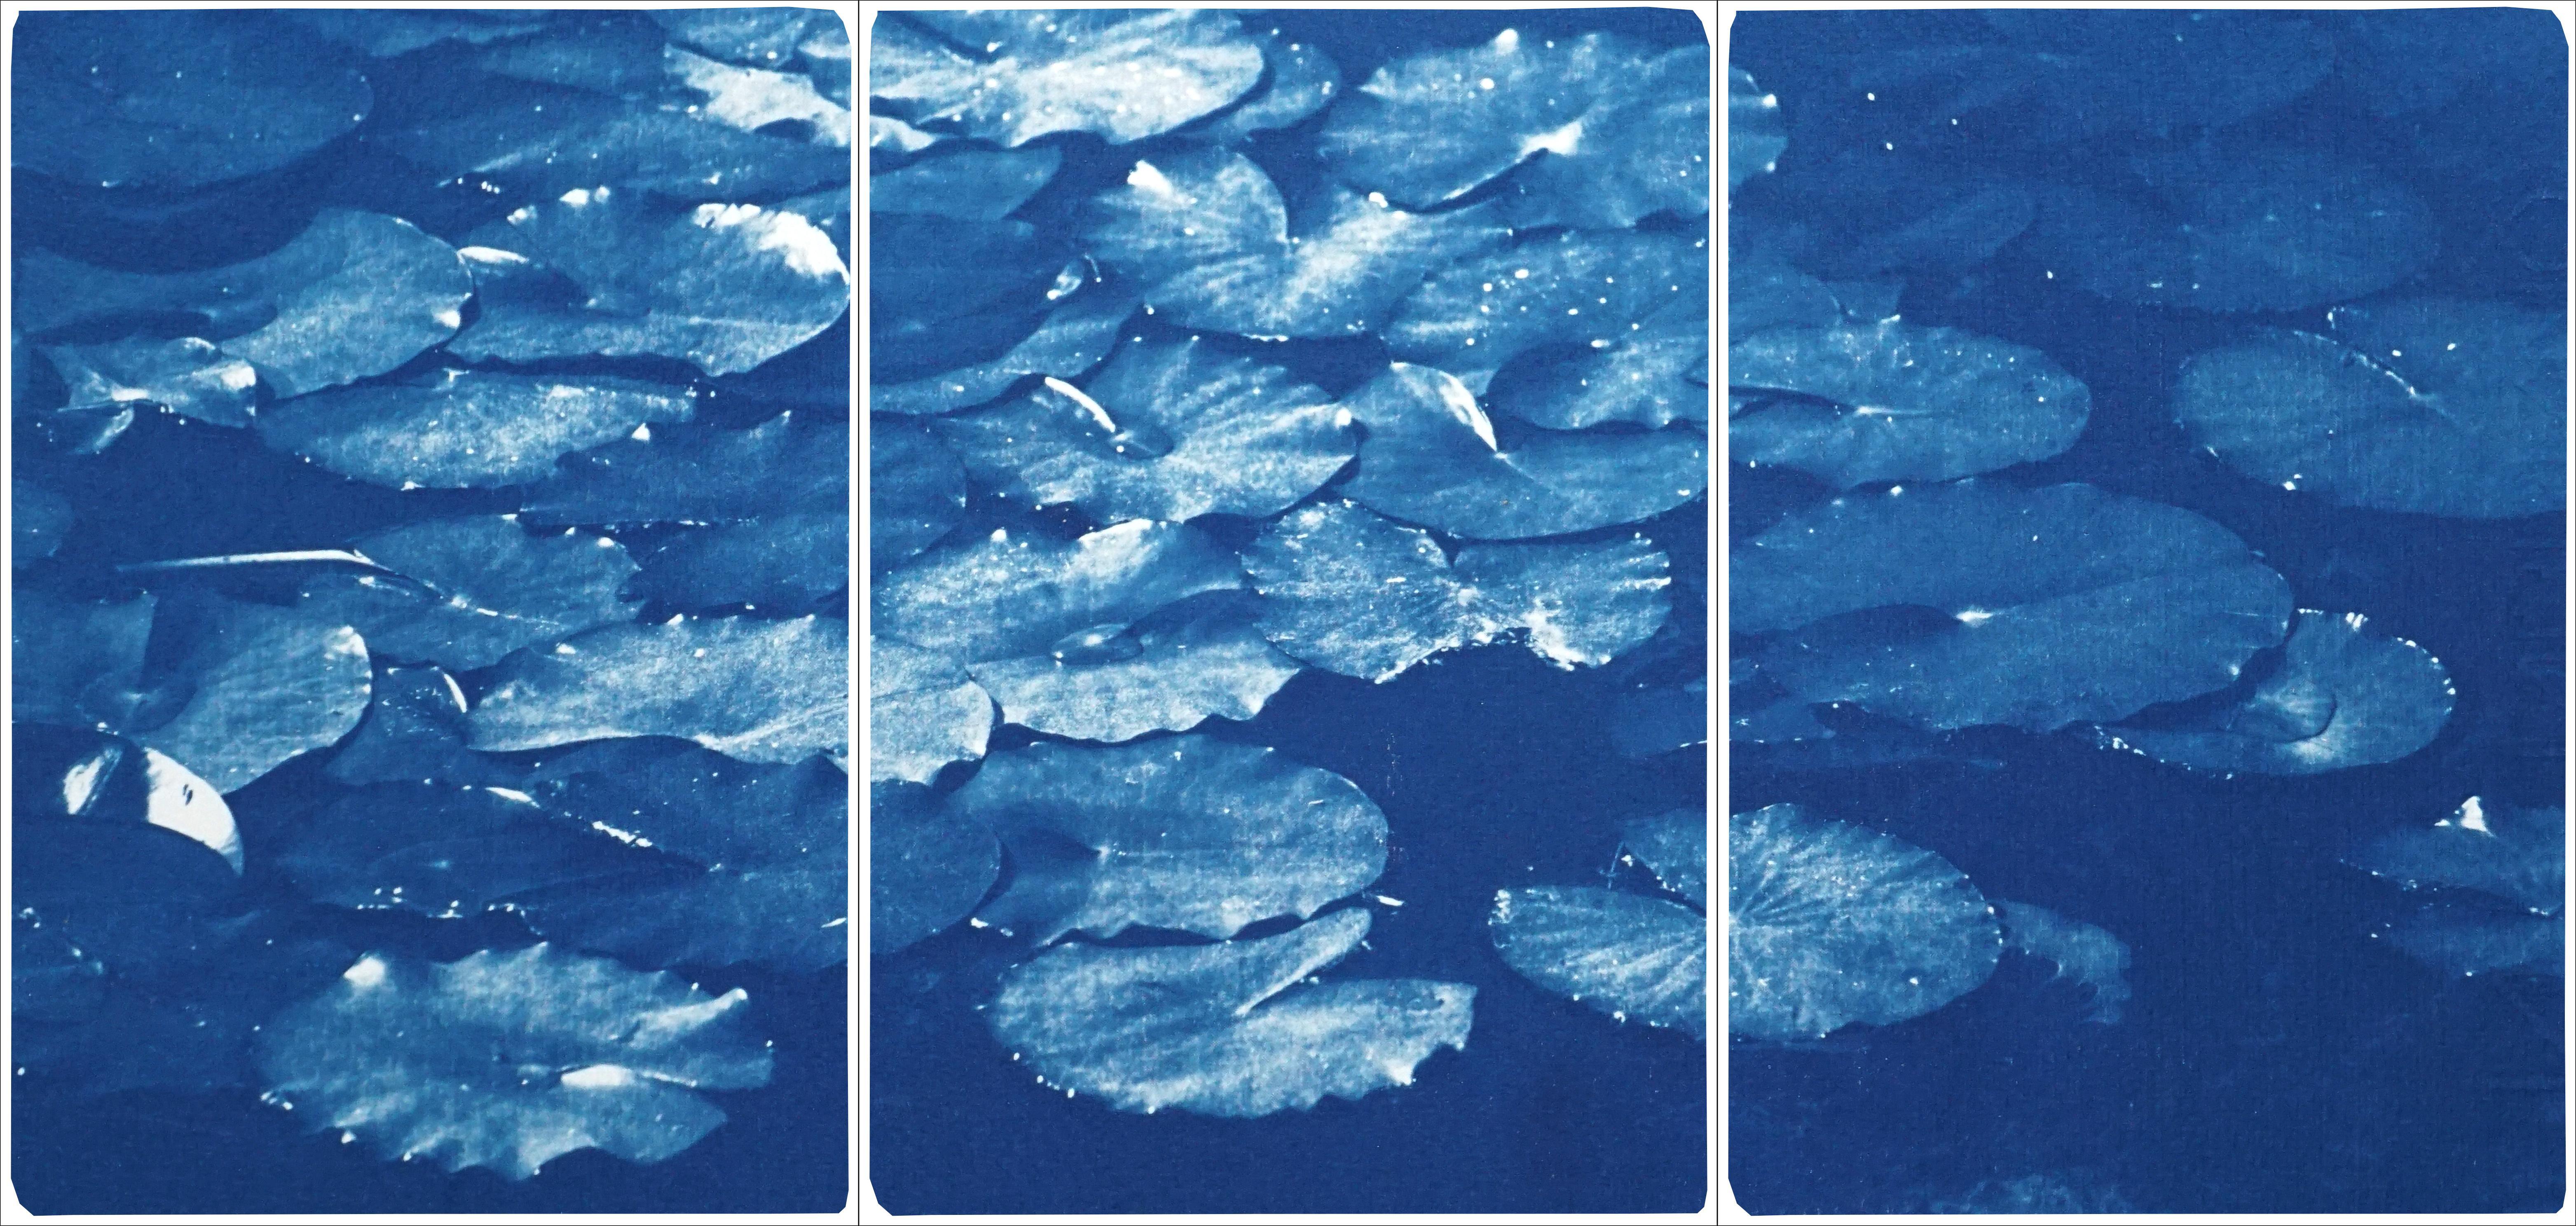 Lilypad Pond Triptych, Large Cyanotype on Watercolor Paper, Zen Blue Landscape